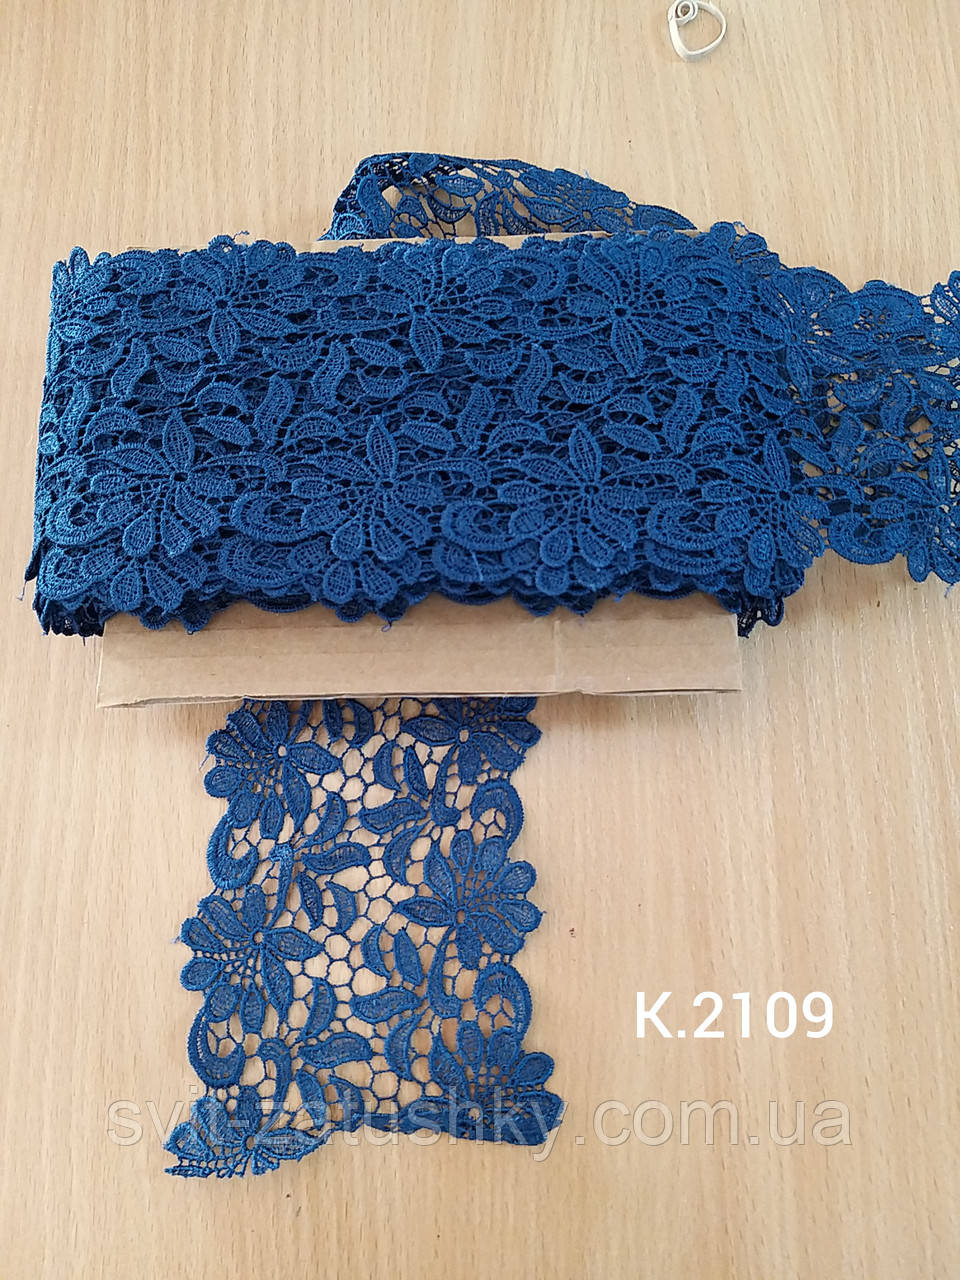 Мереживо темно-синє макраме ширина 10 см  /Кружево  темносинее макраме шириной 10 см